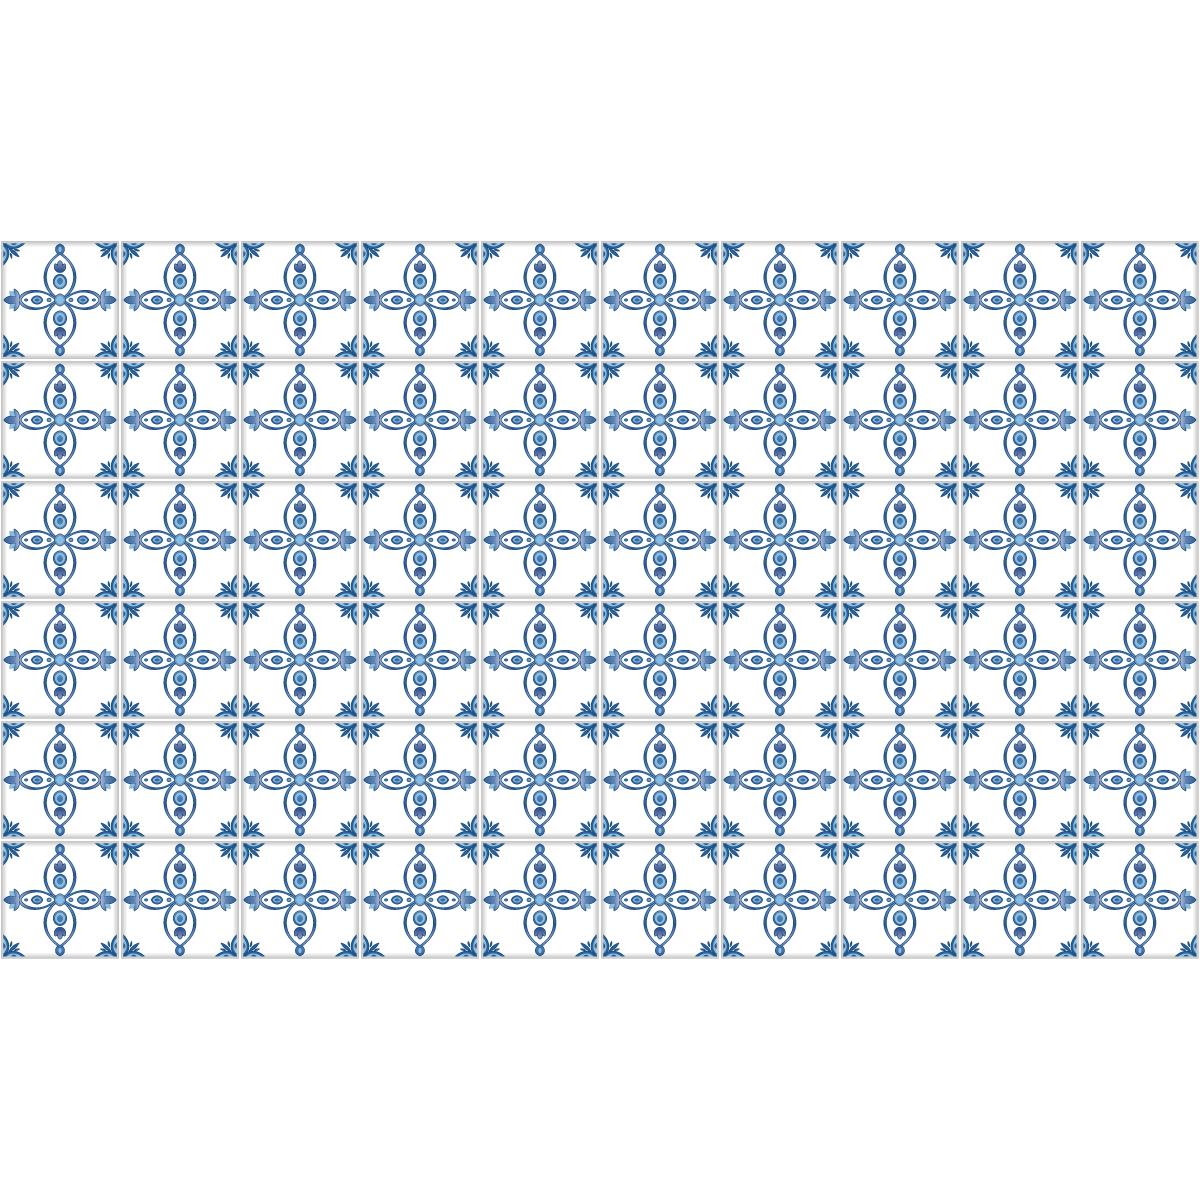 60 stickers carrelages delft tilbourg cuisine carrelages ambiance sticker. Black Bedroom Furniture Sets. Home Design Ideas